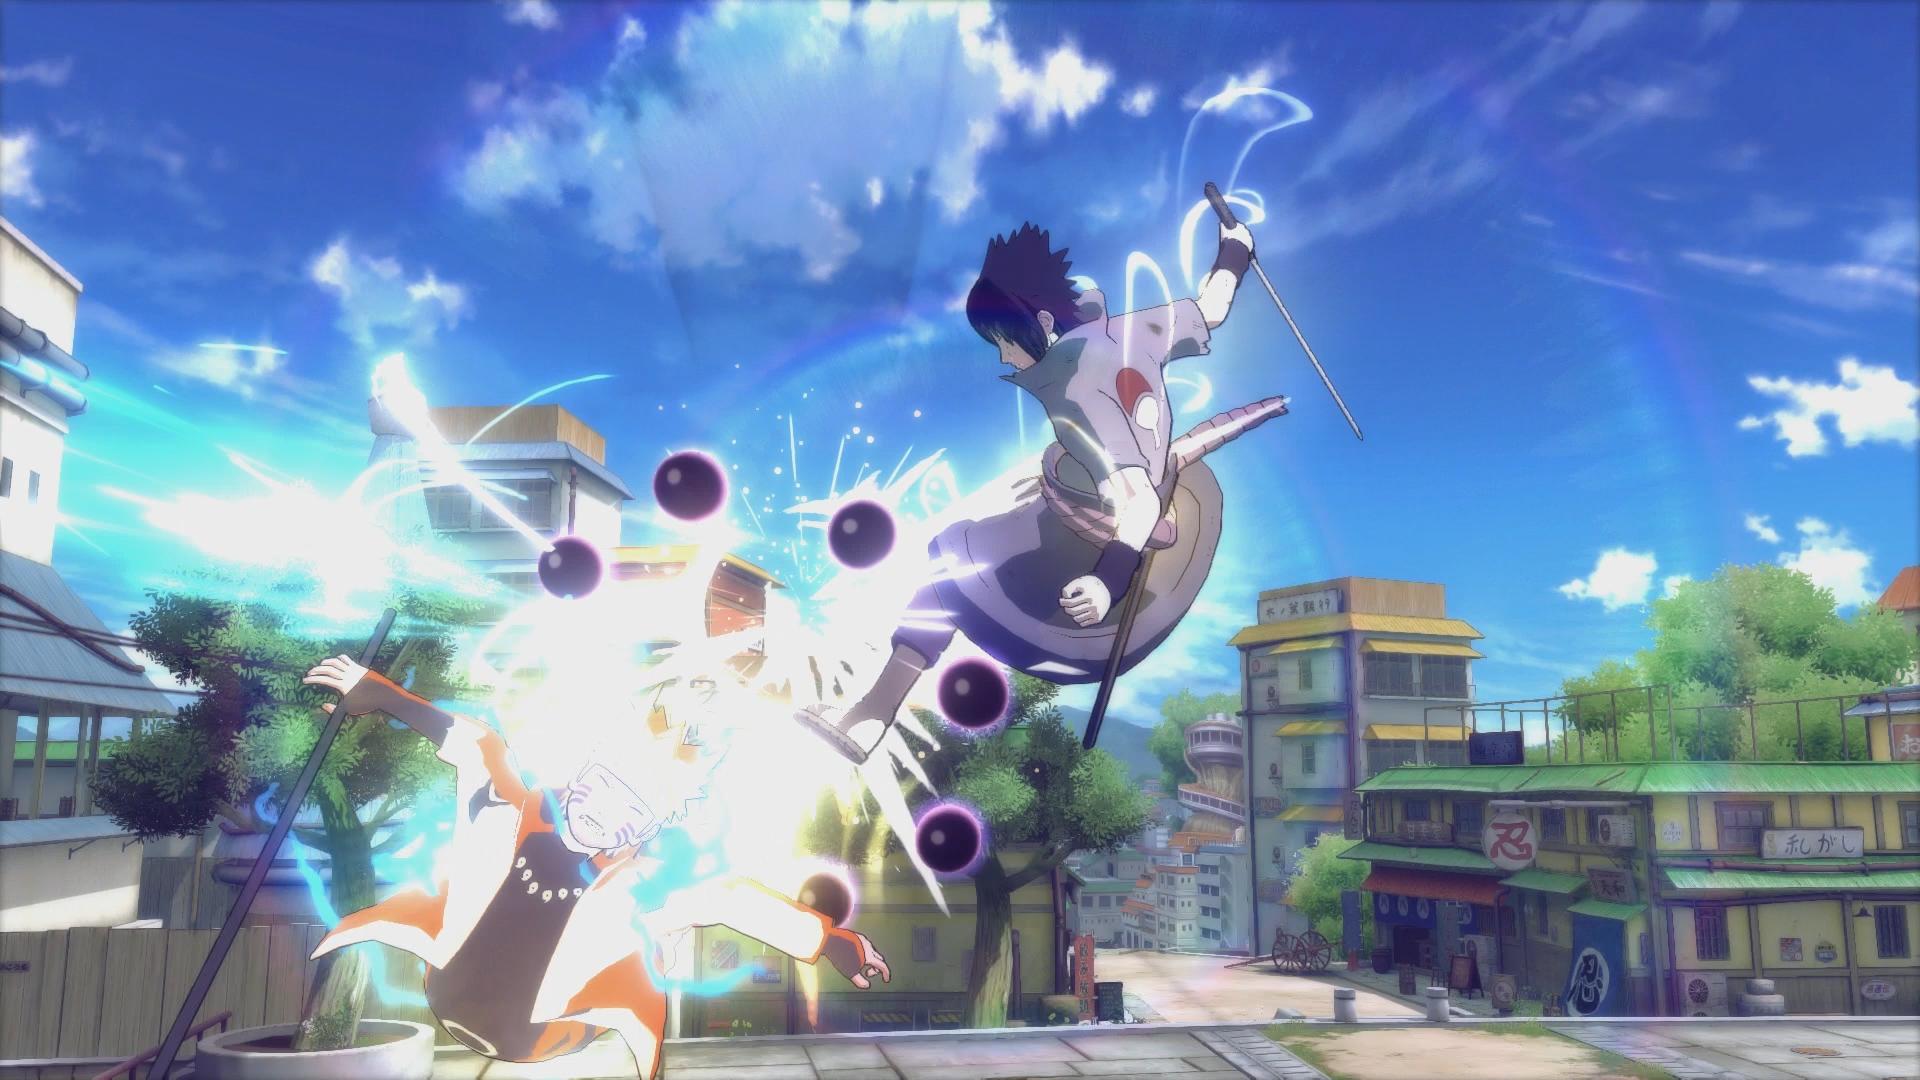 Naruto Shippuden: Ultimate Ninja Storm 4 Pre-Order Bonus and Collector's Edition Announced